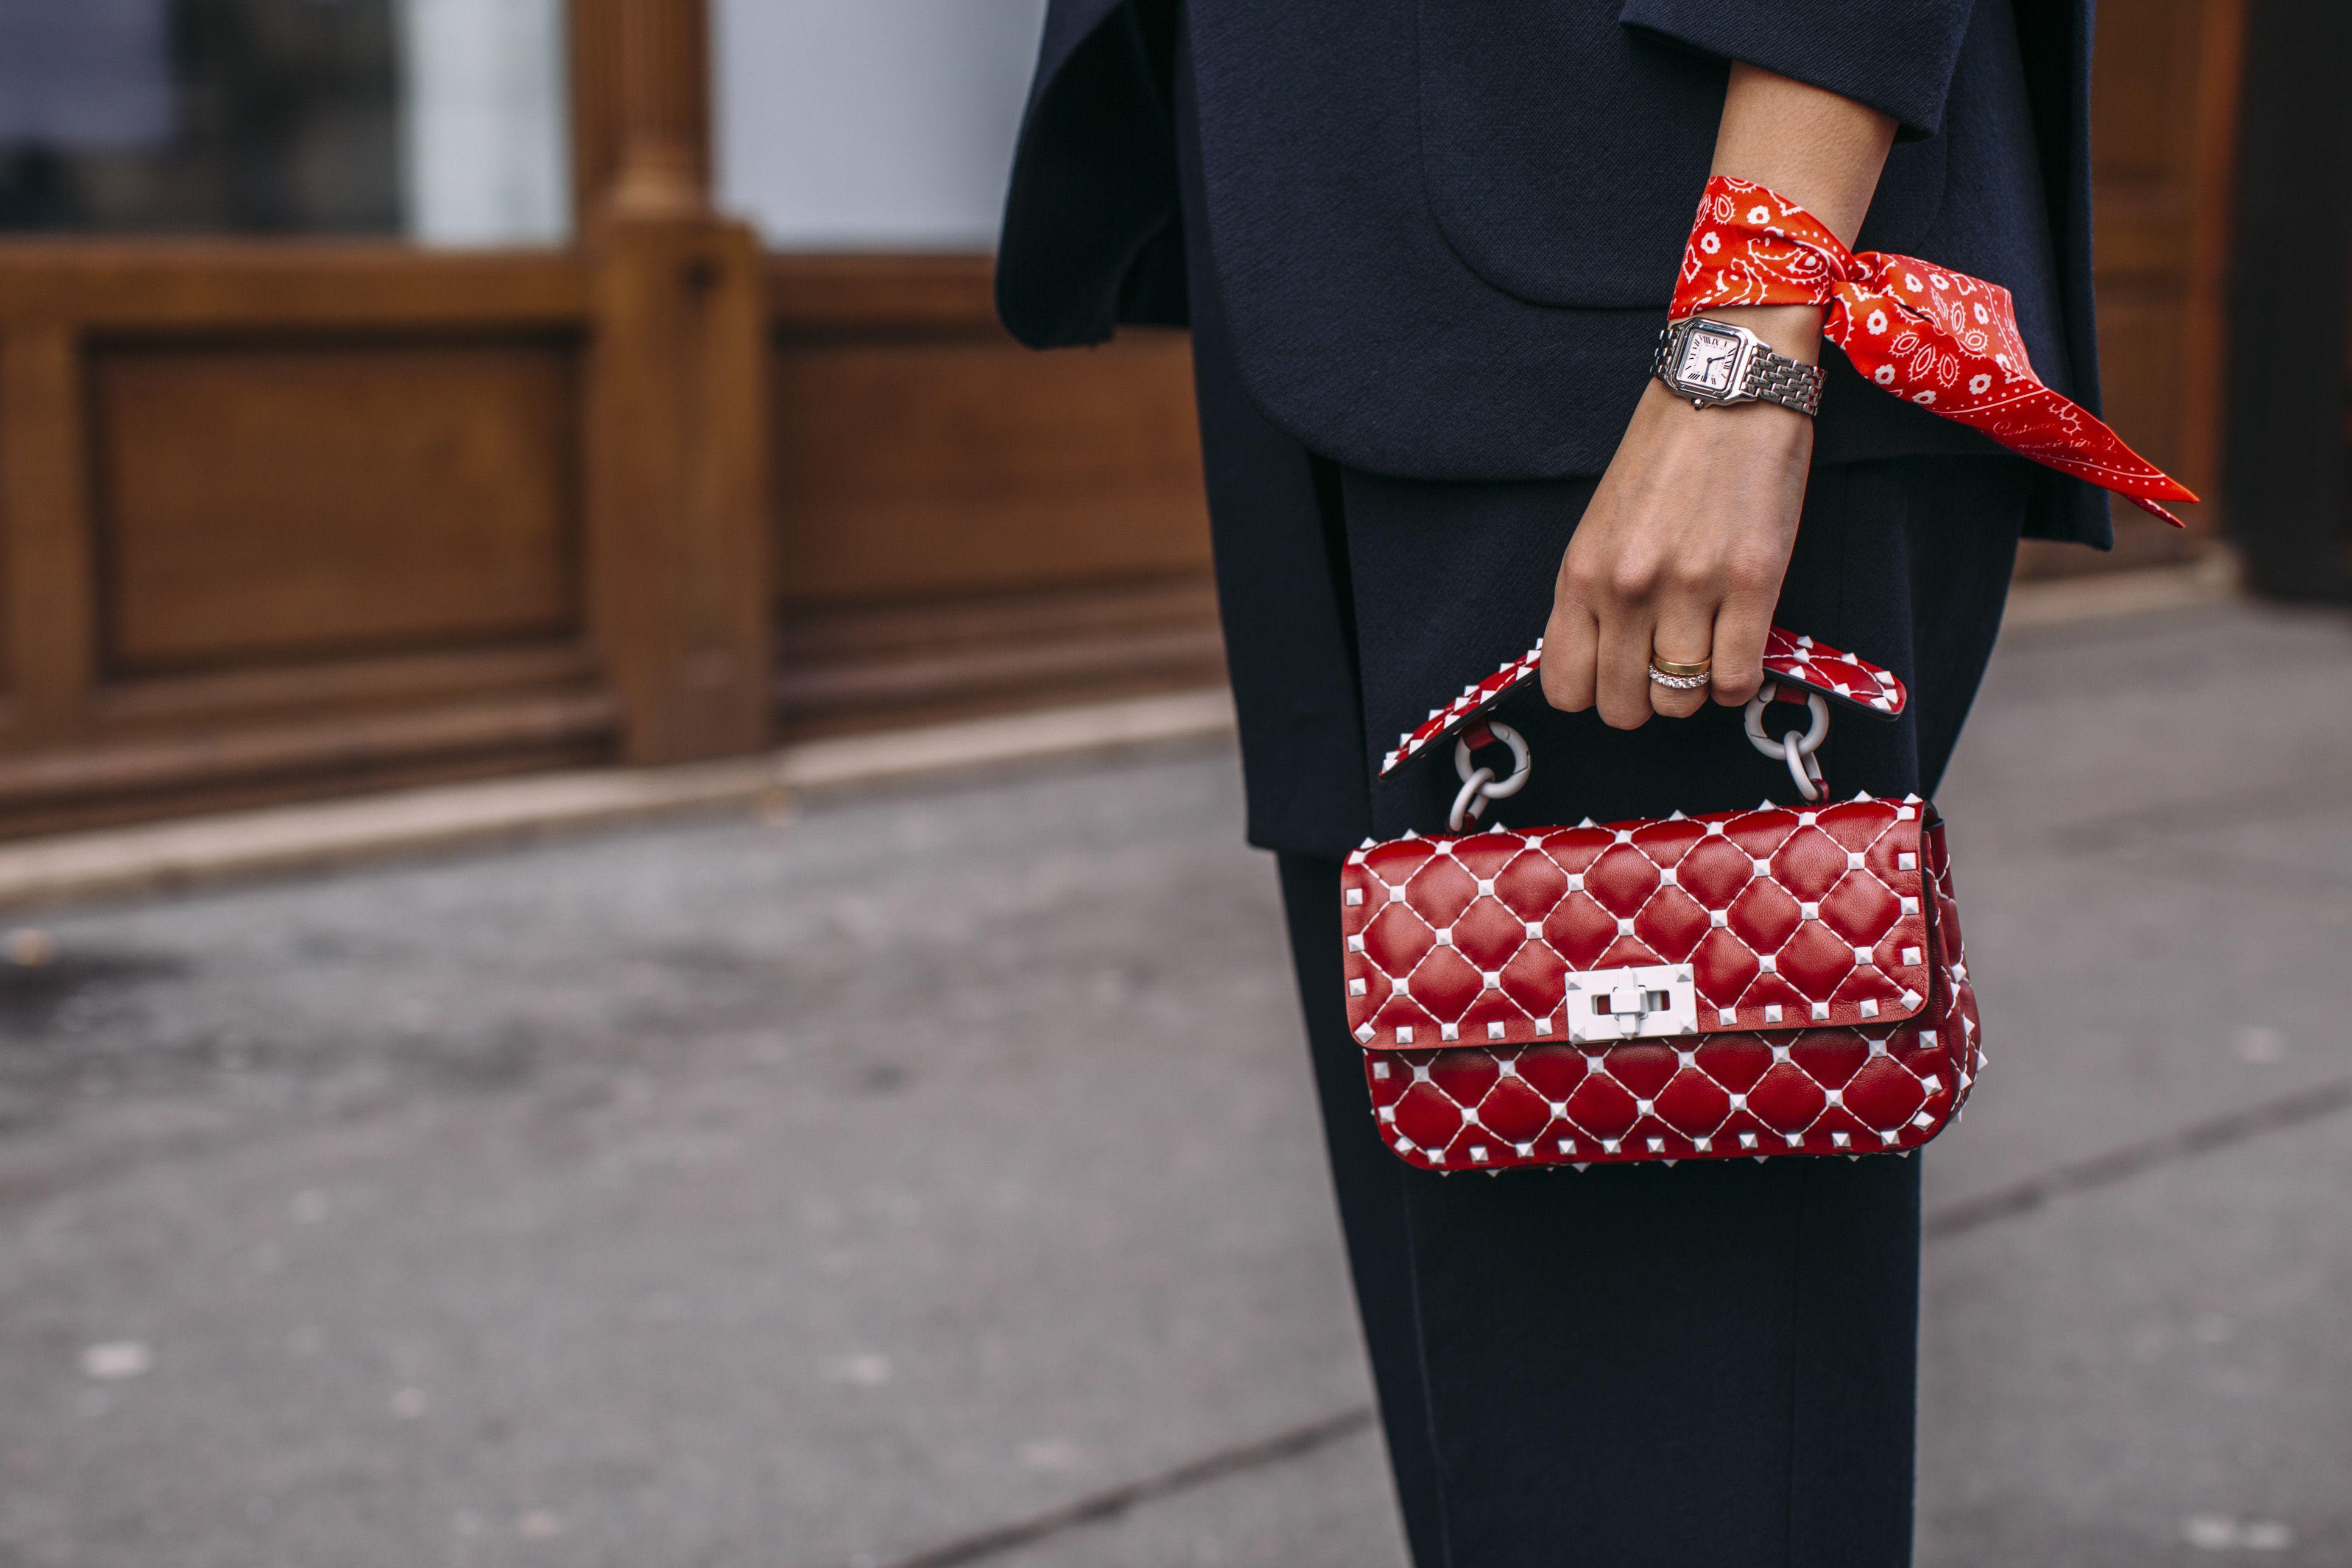 587bd4bdcd Borse Rosse 2019: #6 borse rosse firmate da indossare forever